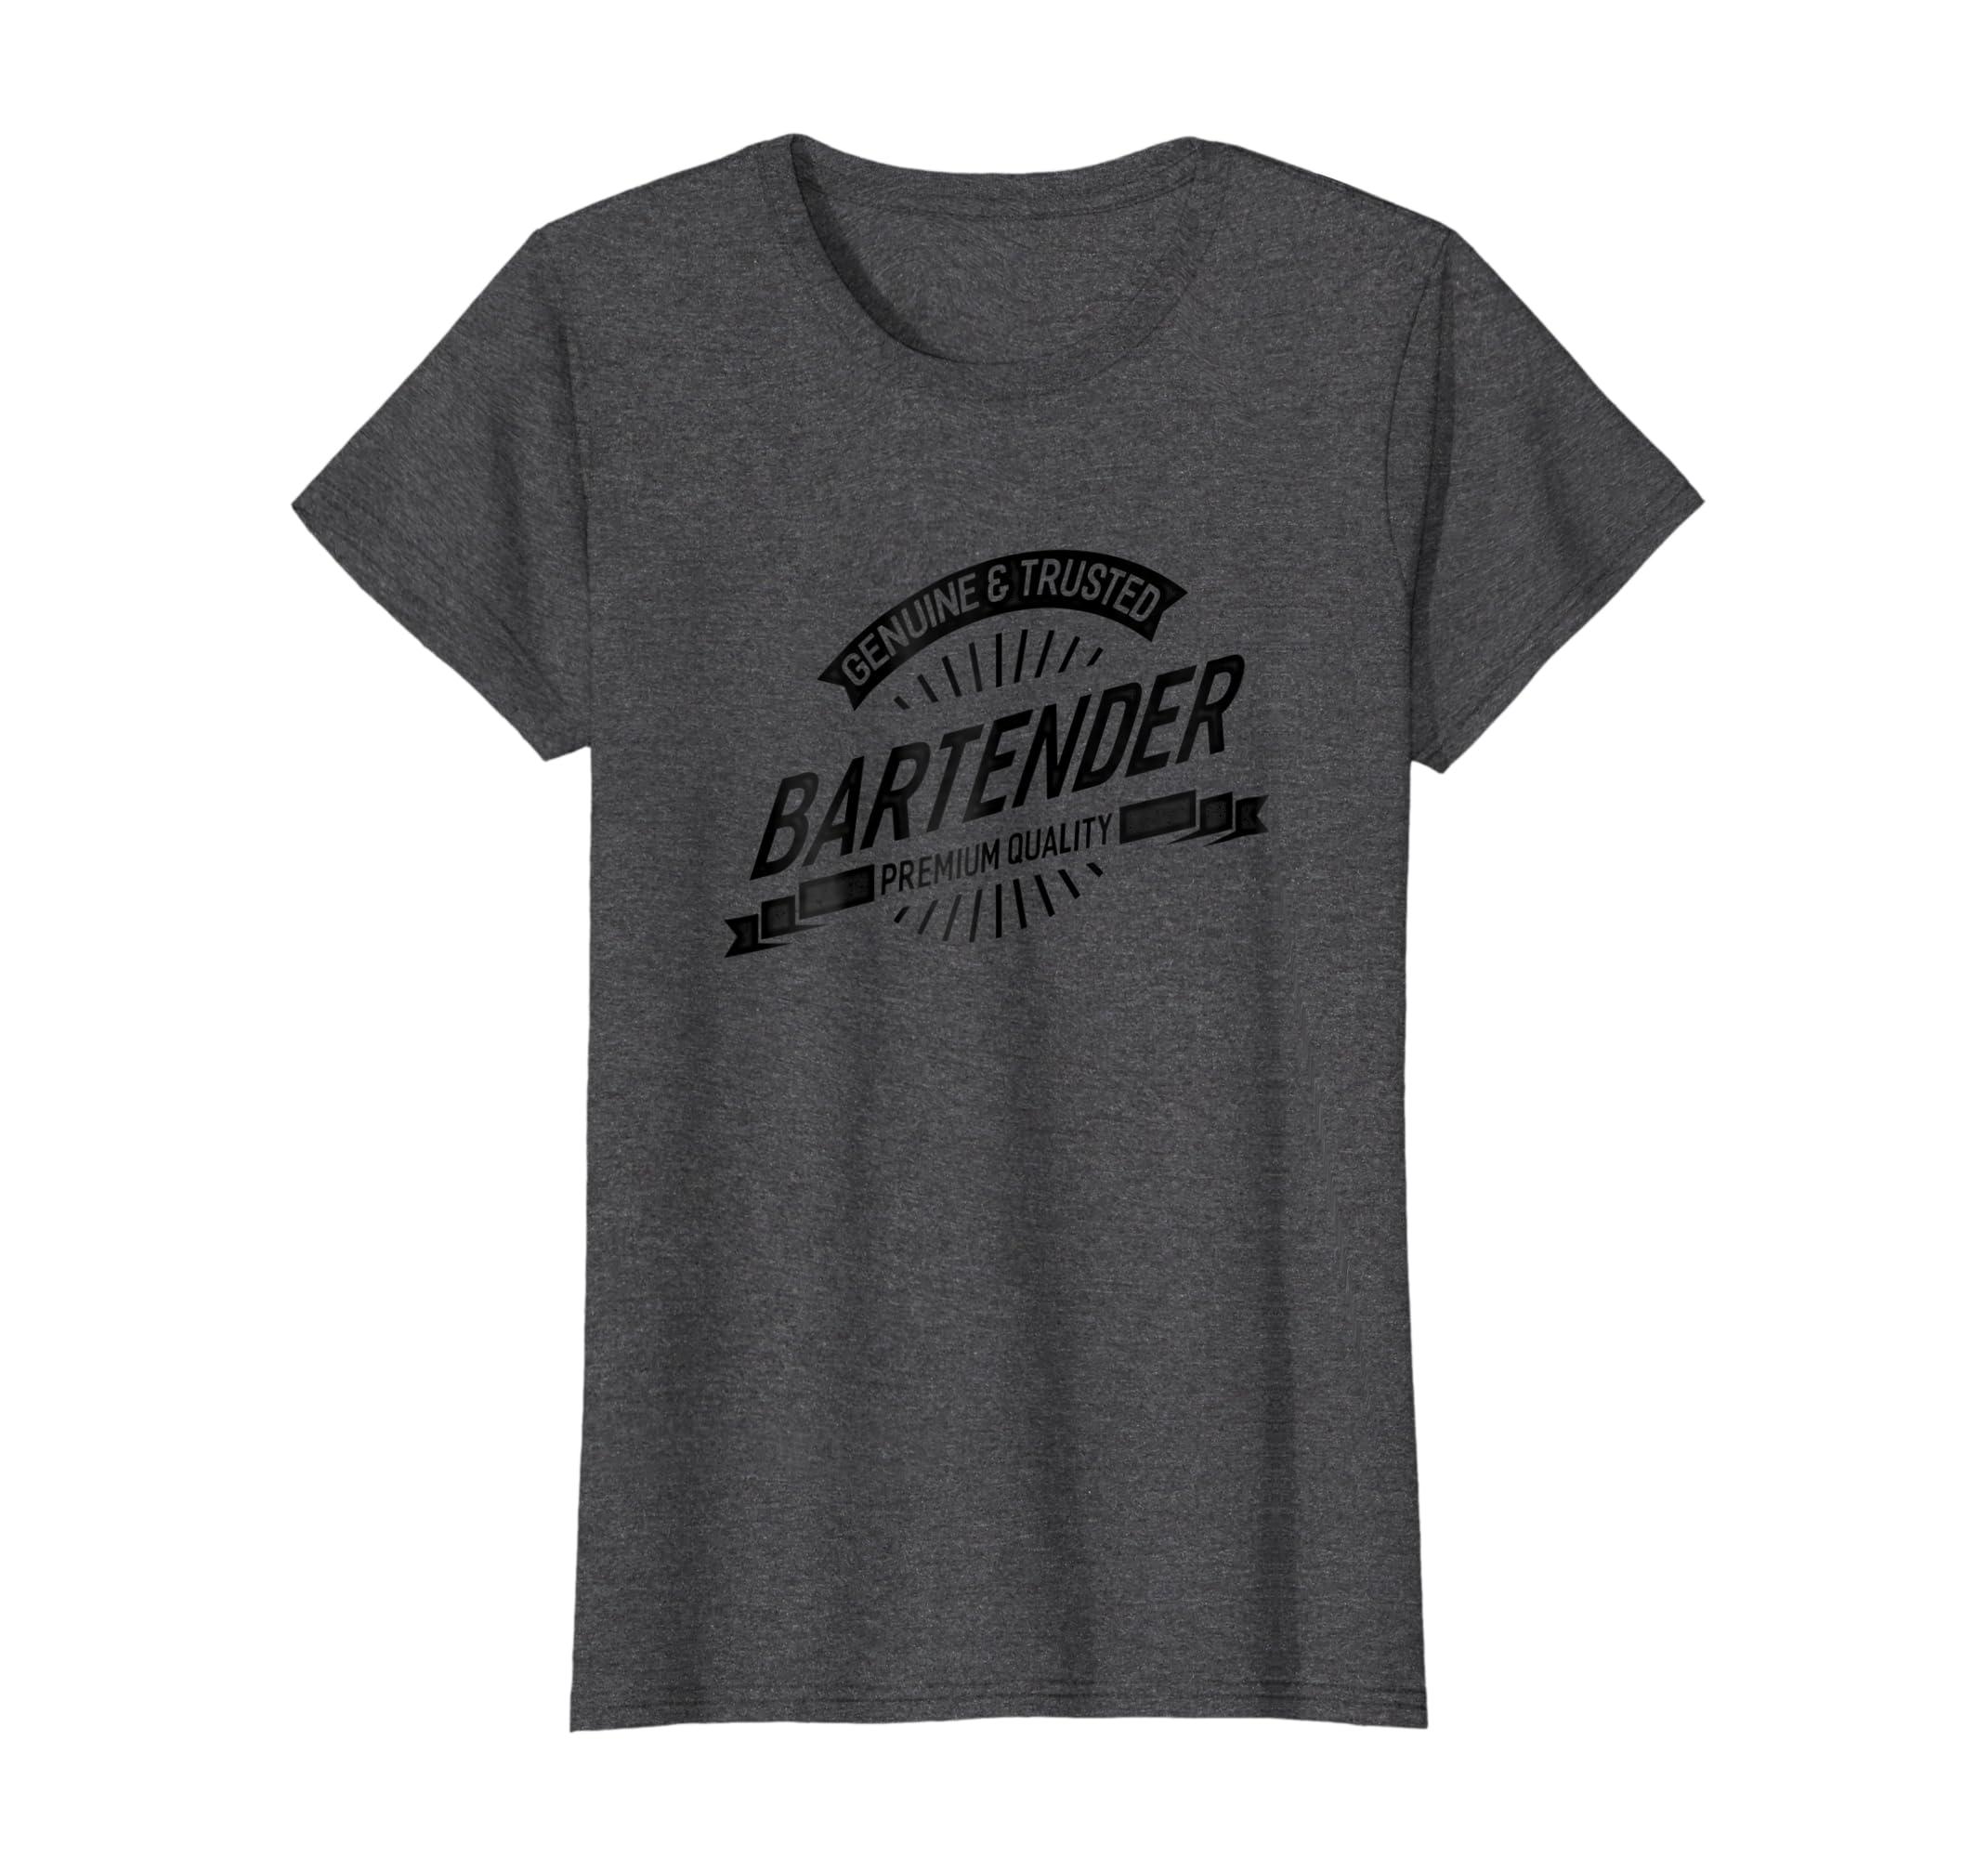 08094242b Amazon.com: Genuine Trusted Bartender Shirt For Women Men Gift T-shirt:  Clothing